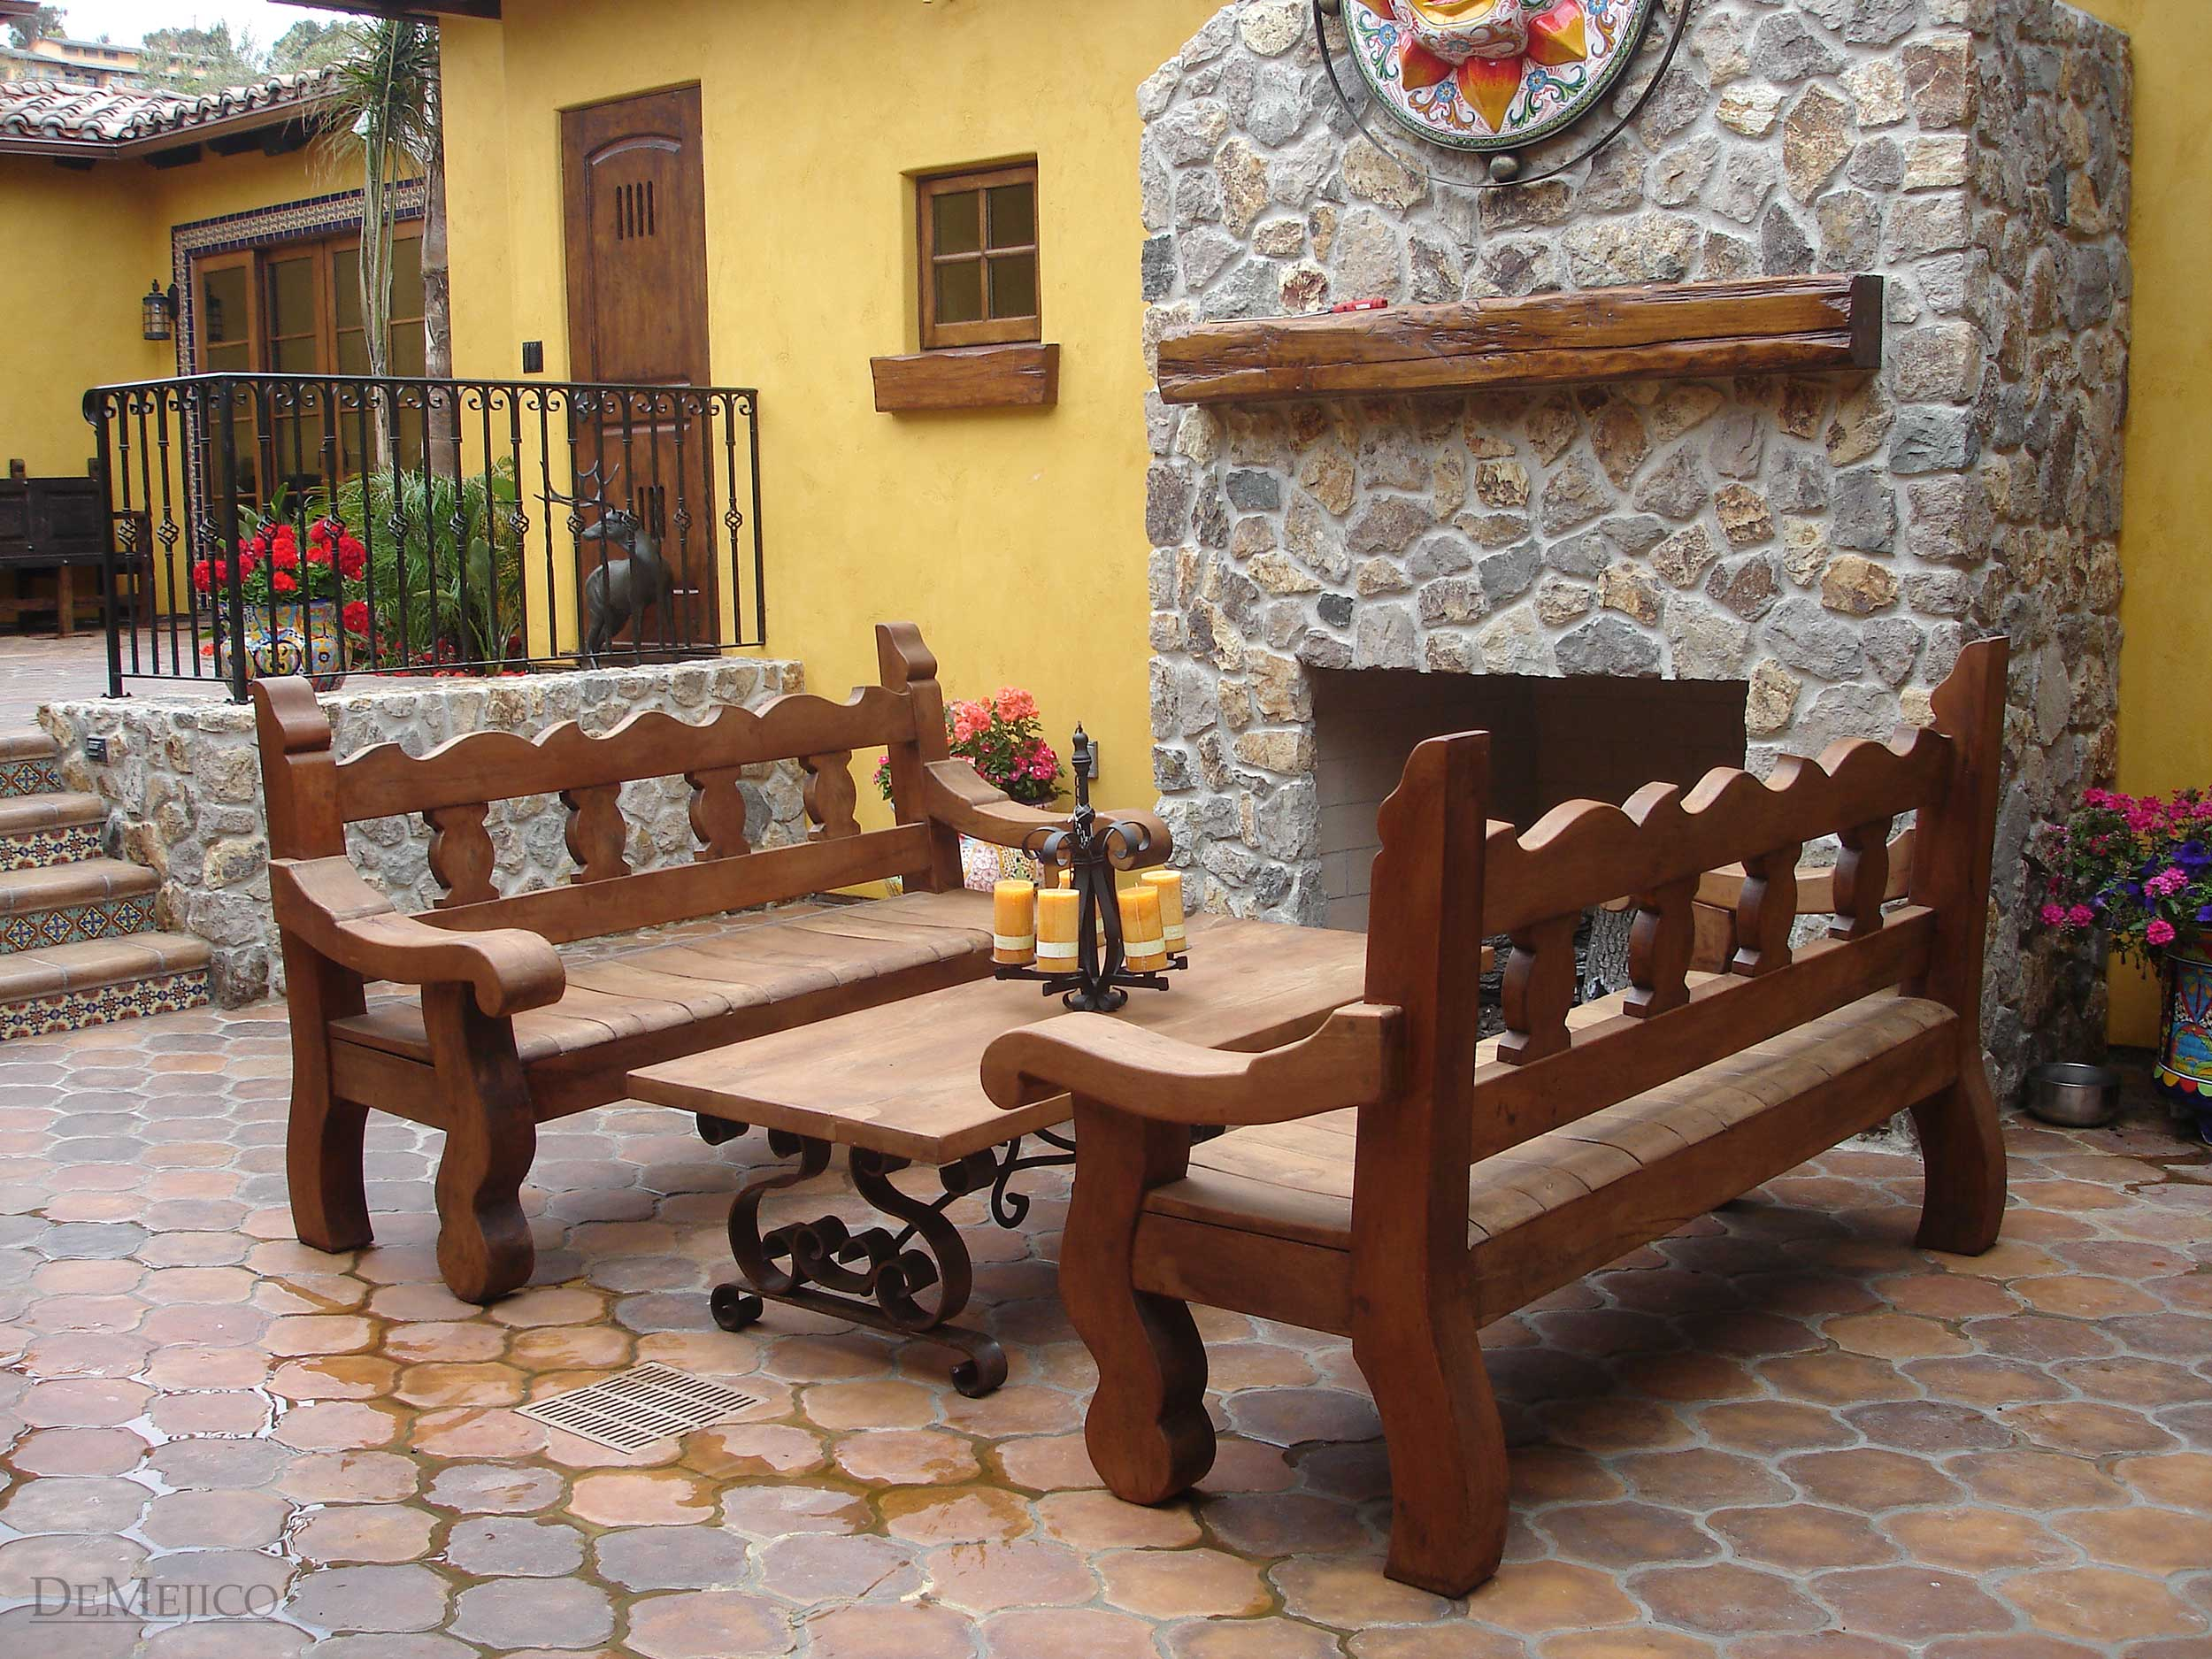 Spanish Furniture Spanish Outdoor Furniture Demejico